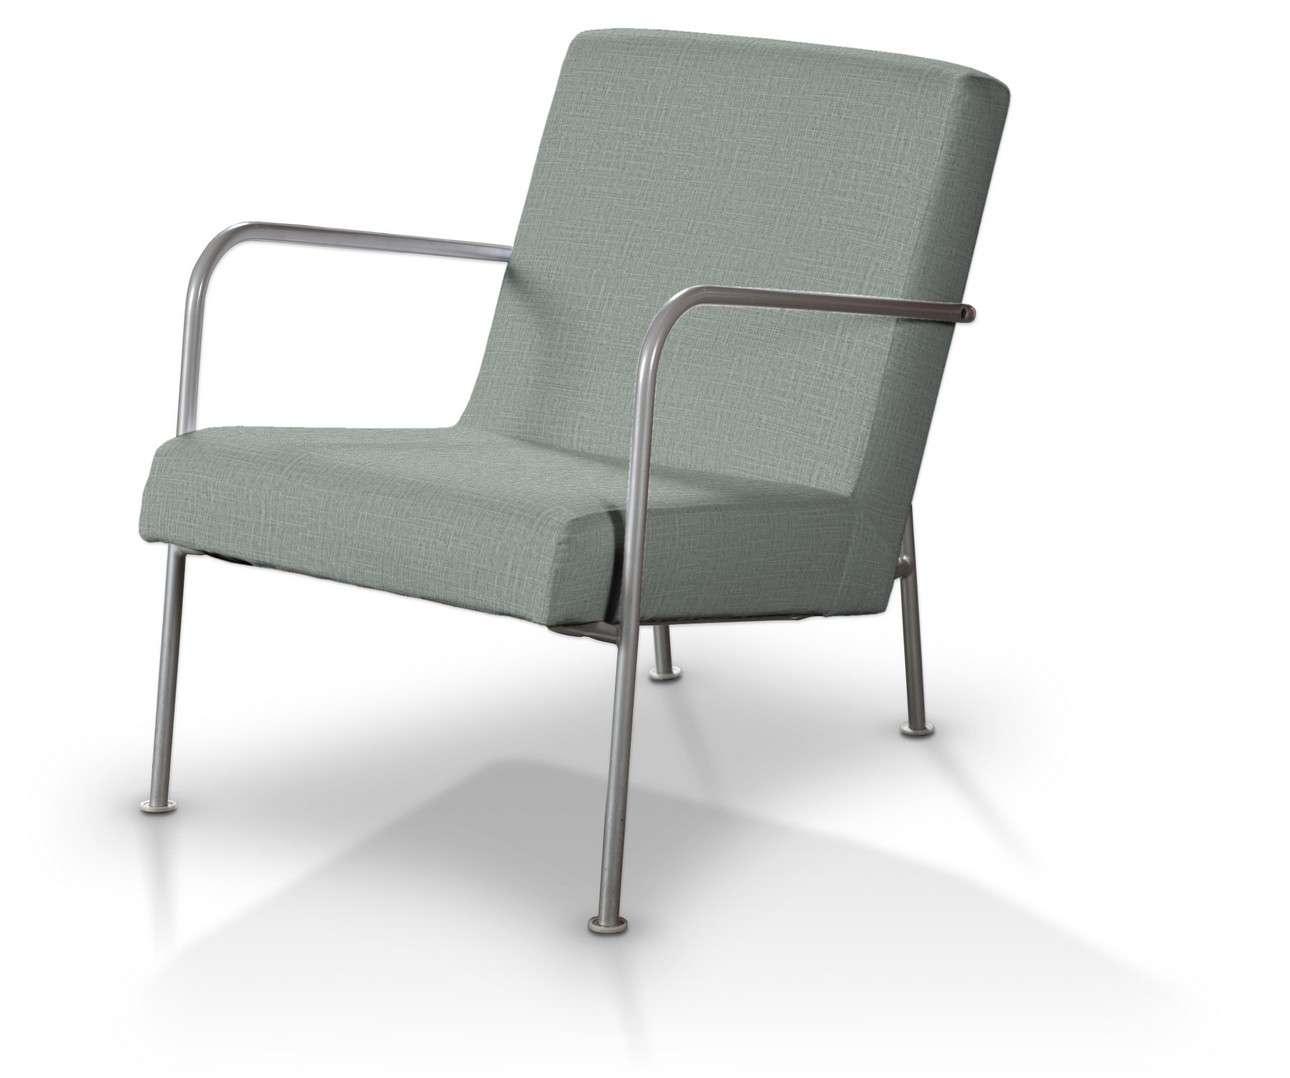 Pokrowiec na fotel Ikea PS w kolekcji Living II, tkanina: 160-86